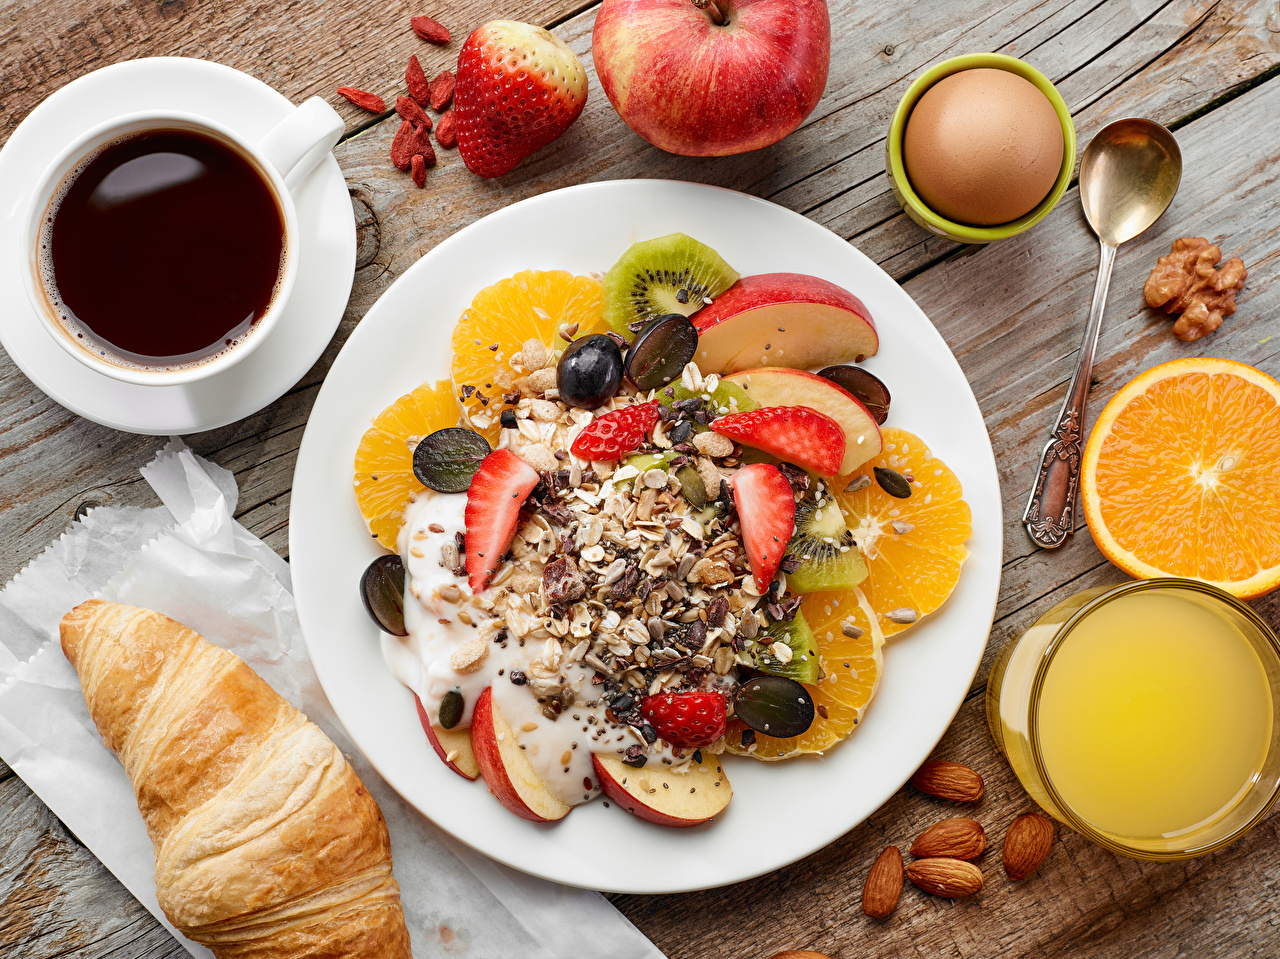 Photos egg Juice Coffee Croissant Breakfast Cup Food Plate Fruit Muesli Nuts boards Eggs Wood planks